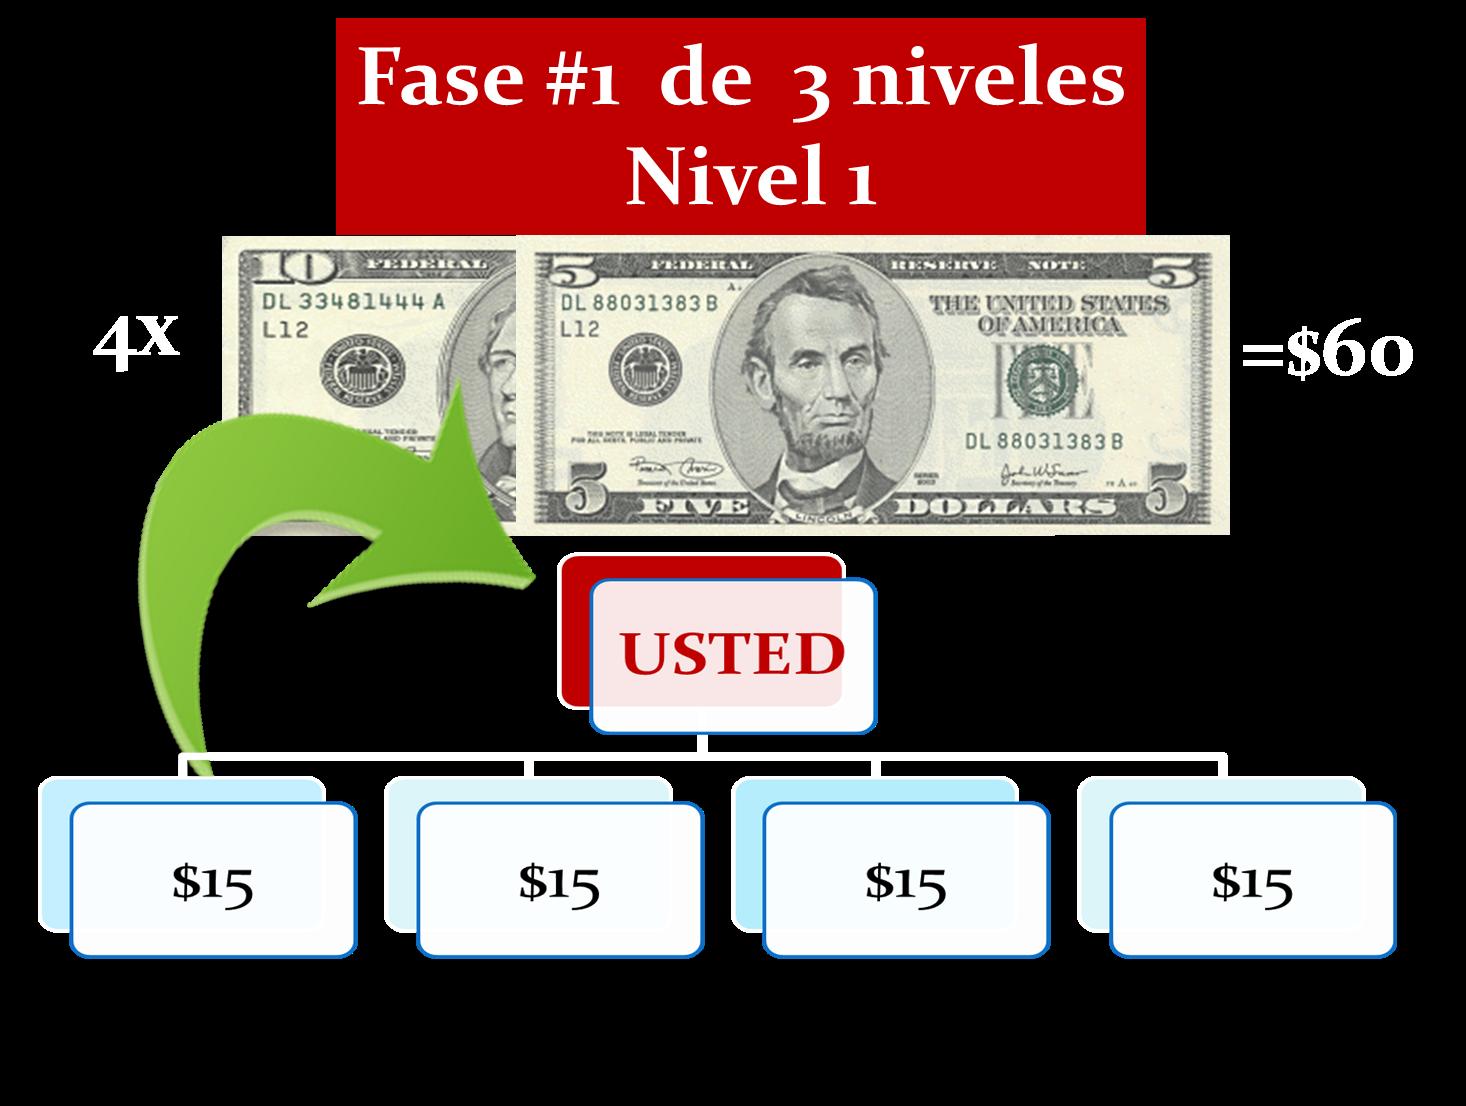 Extra Turbo Pay Matriz mundial - NO hace falta referir Fase1-1